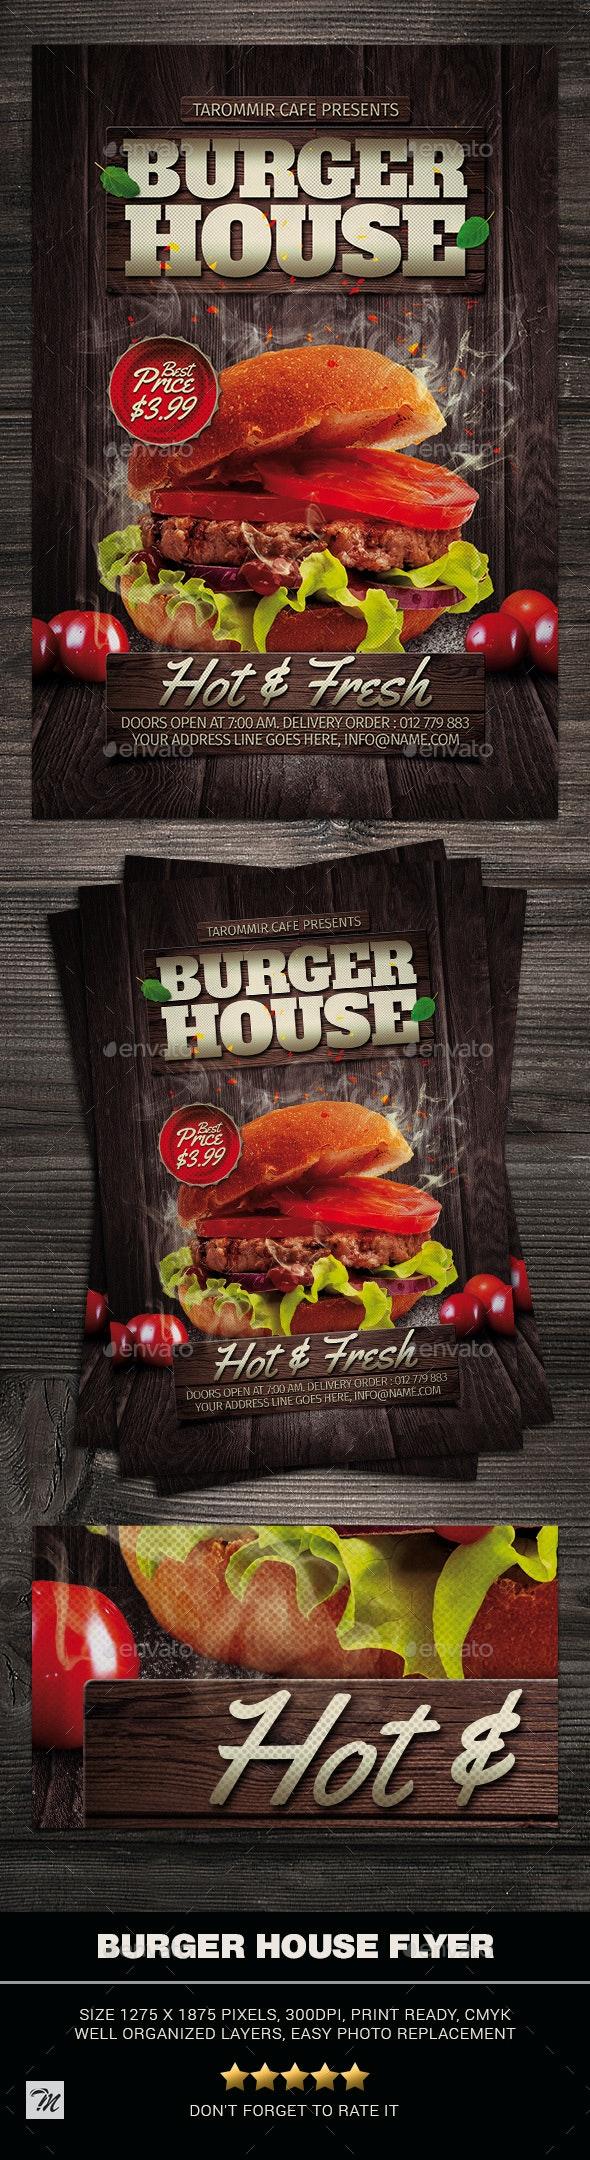 Burger House Flyer - Restaurant Flyers